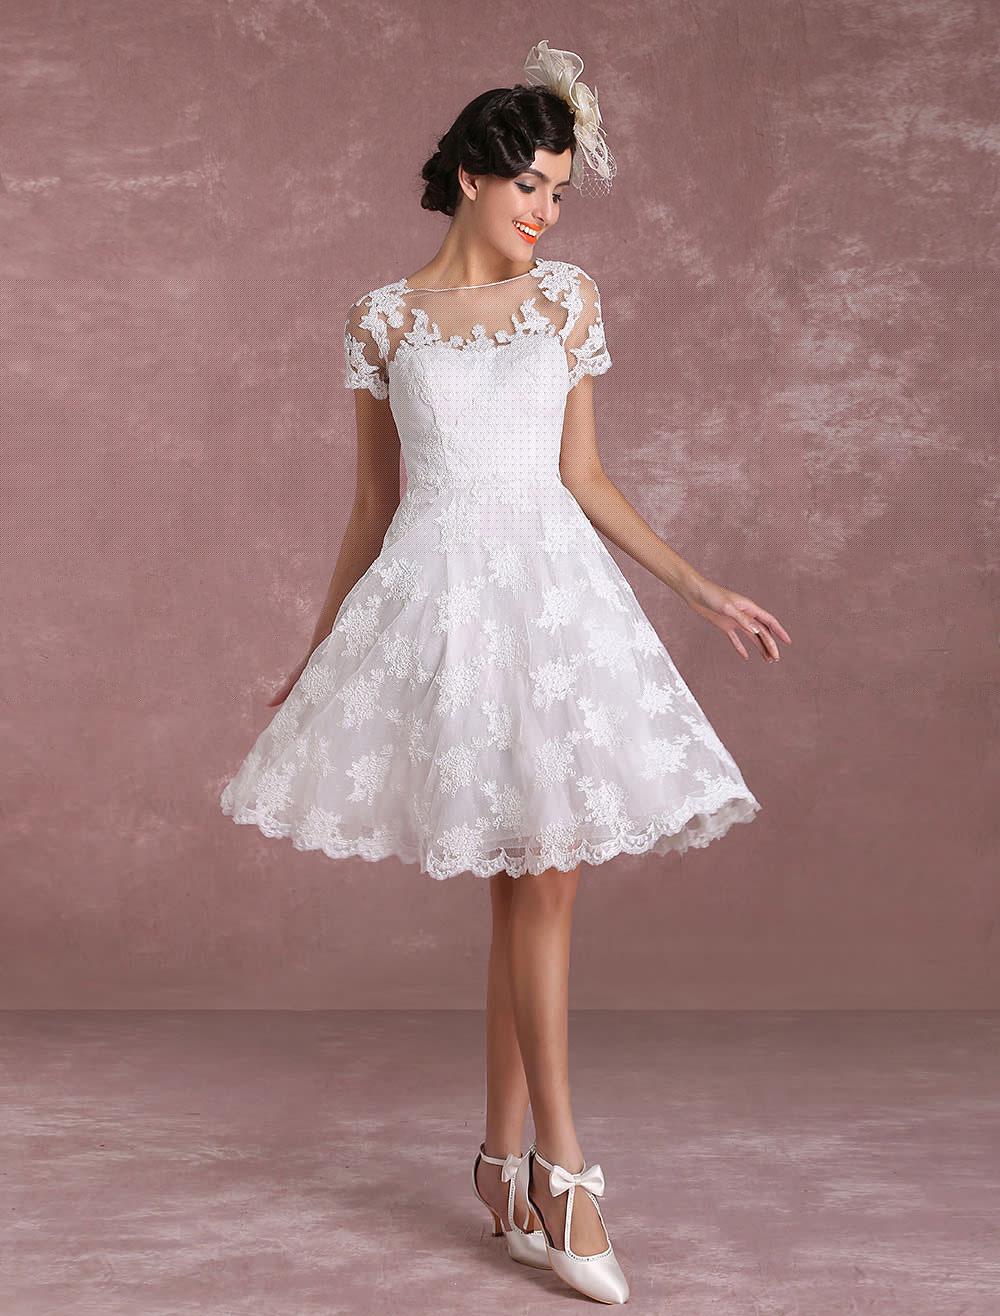 vintage wedding dresses 2018 short lace applique bridal gown short sleeve illusion bridal dress. Black Bedroom Furniture Sets. Home Design Ideas